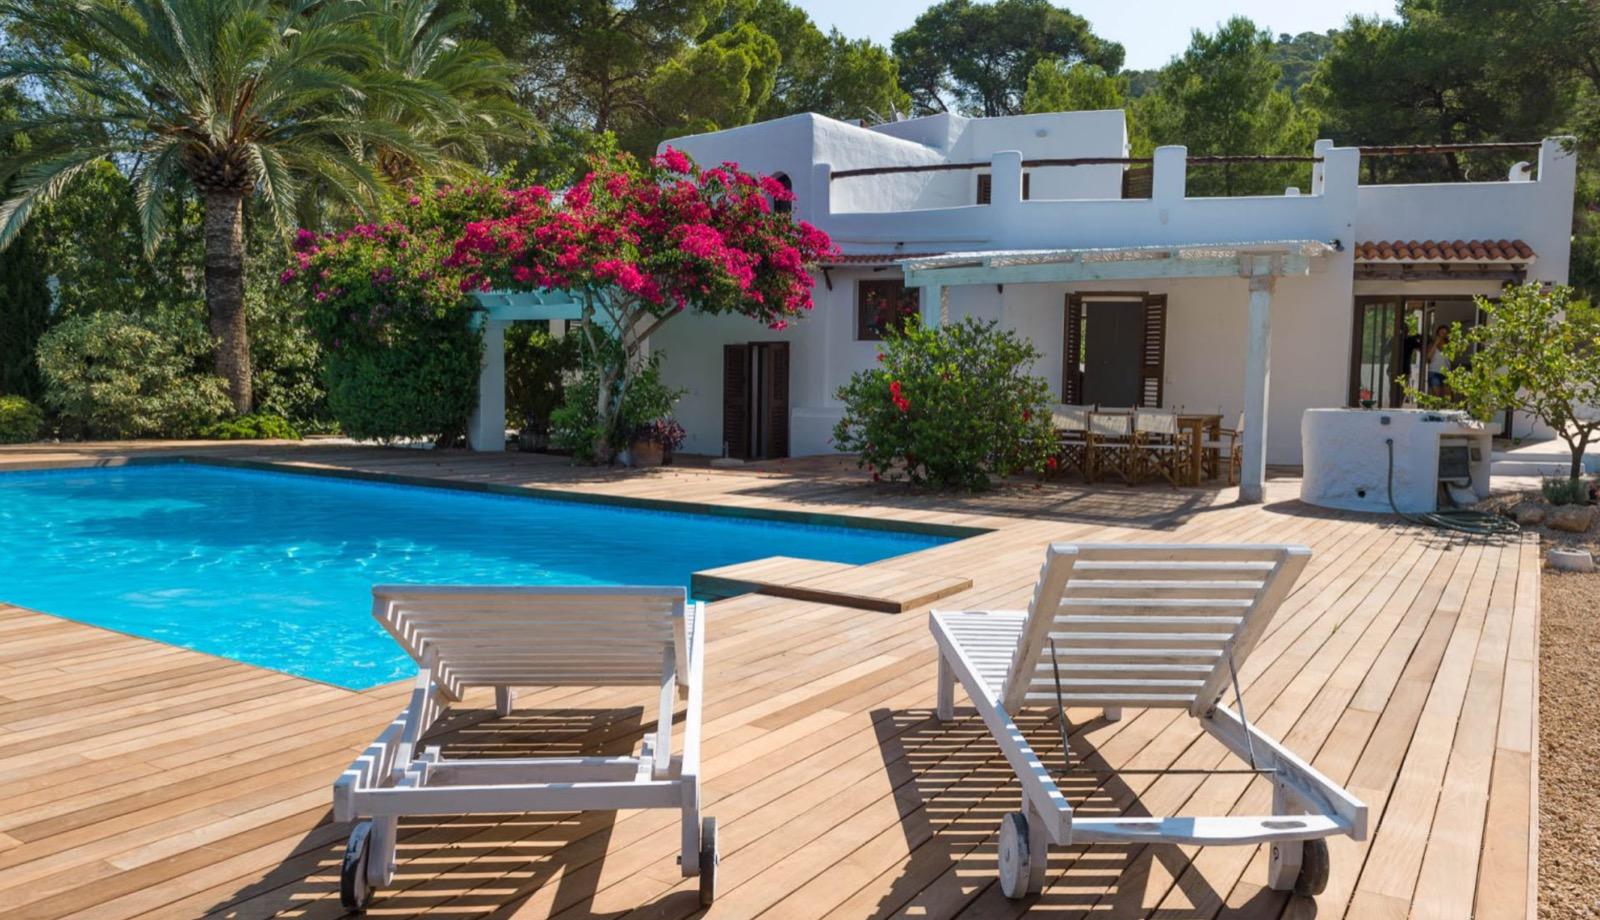 425 villa la salinas iangella ex nuriac9869460-cd01-43a9-8a3a-fe8efcc9b0ba